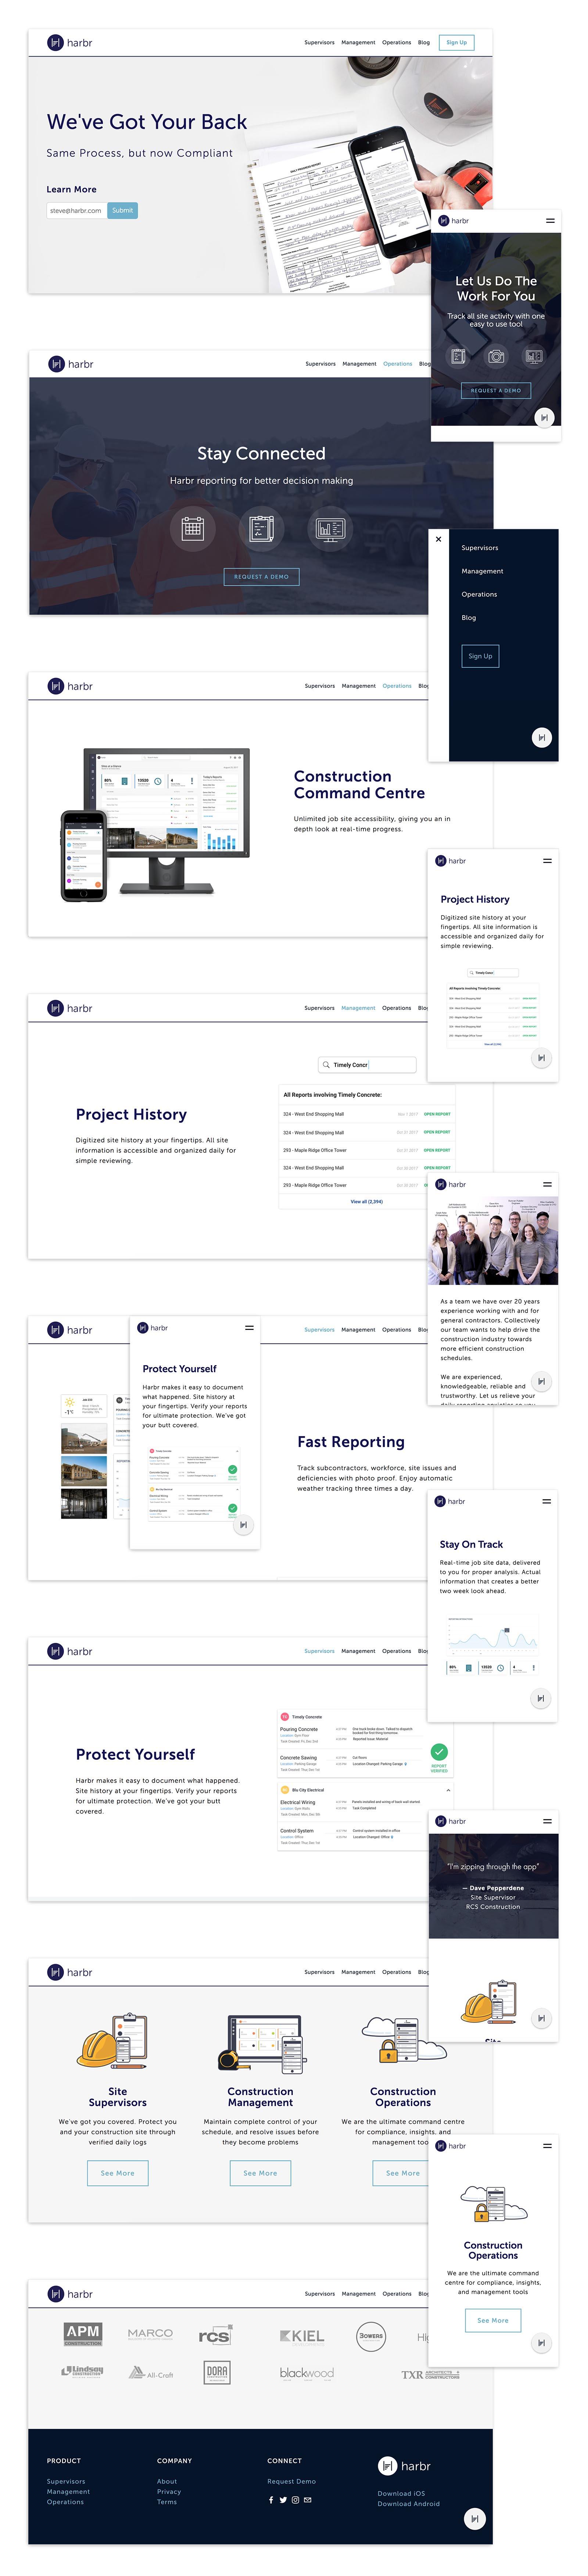 harbr website.jpg